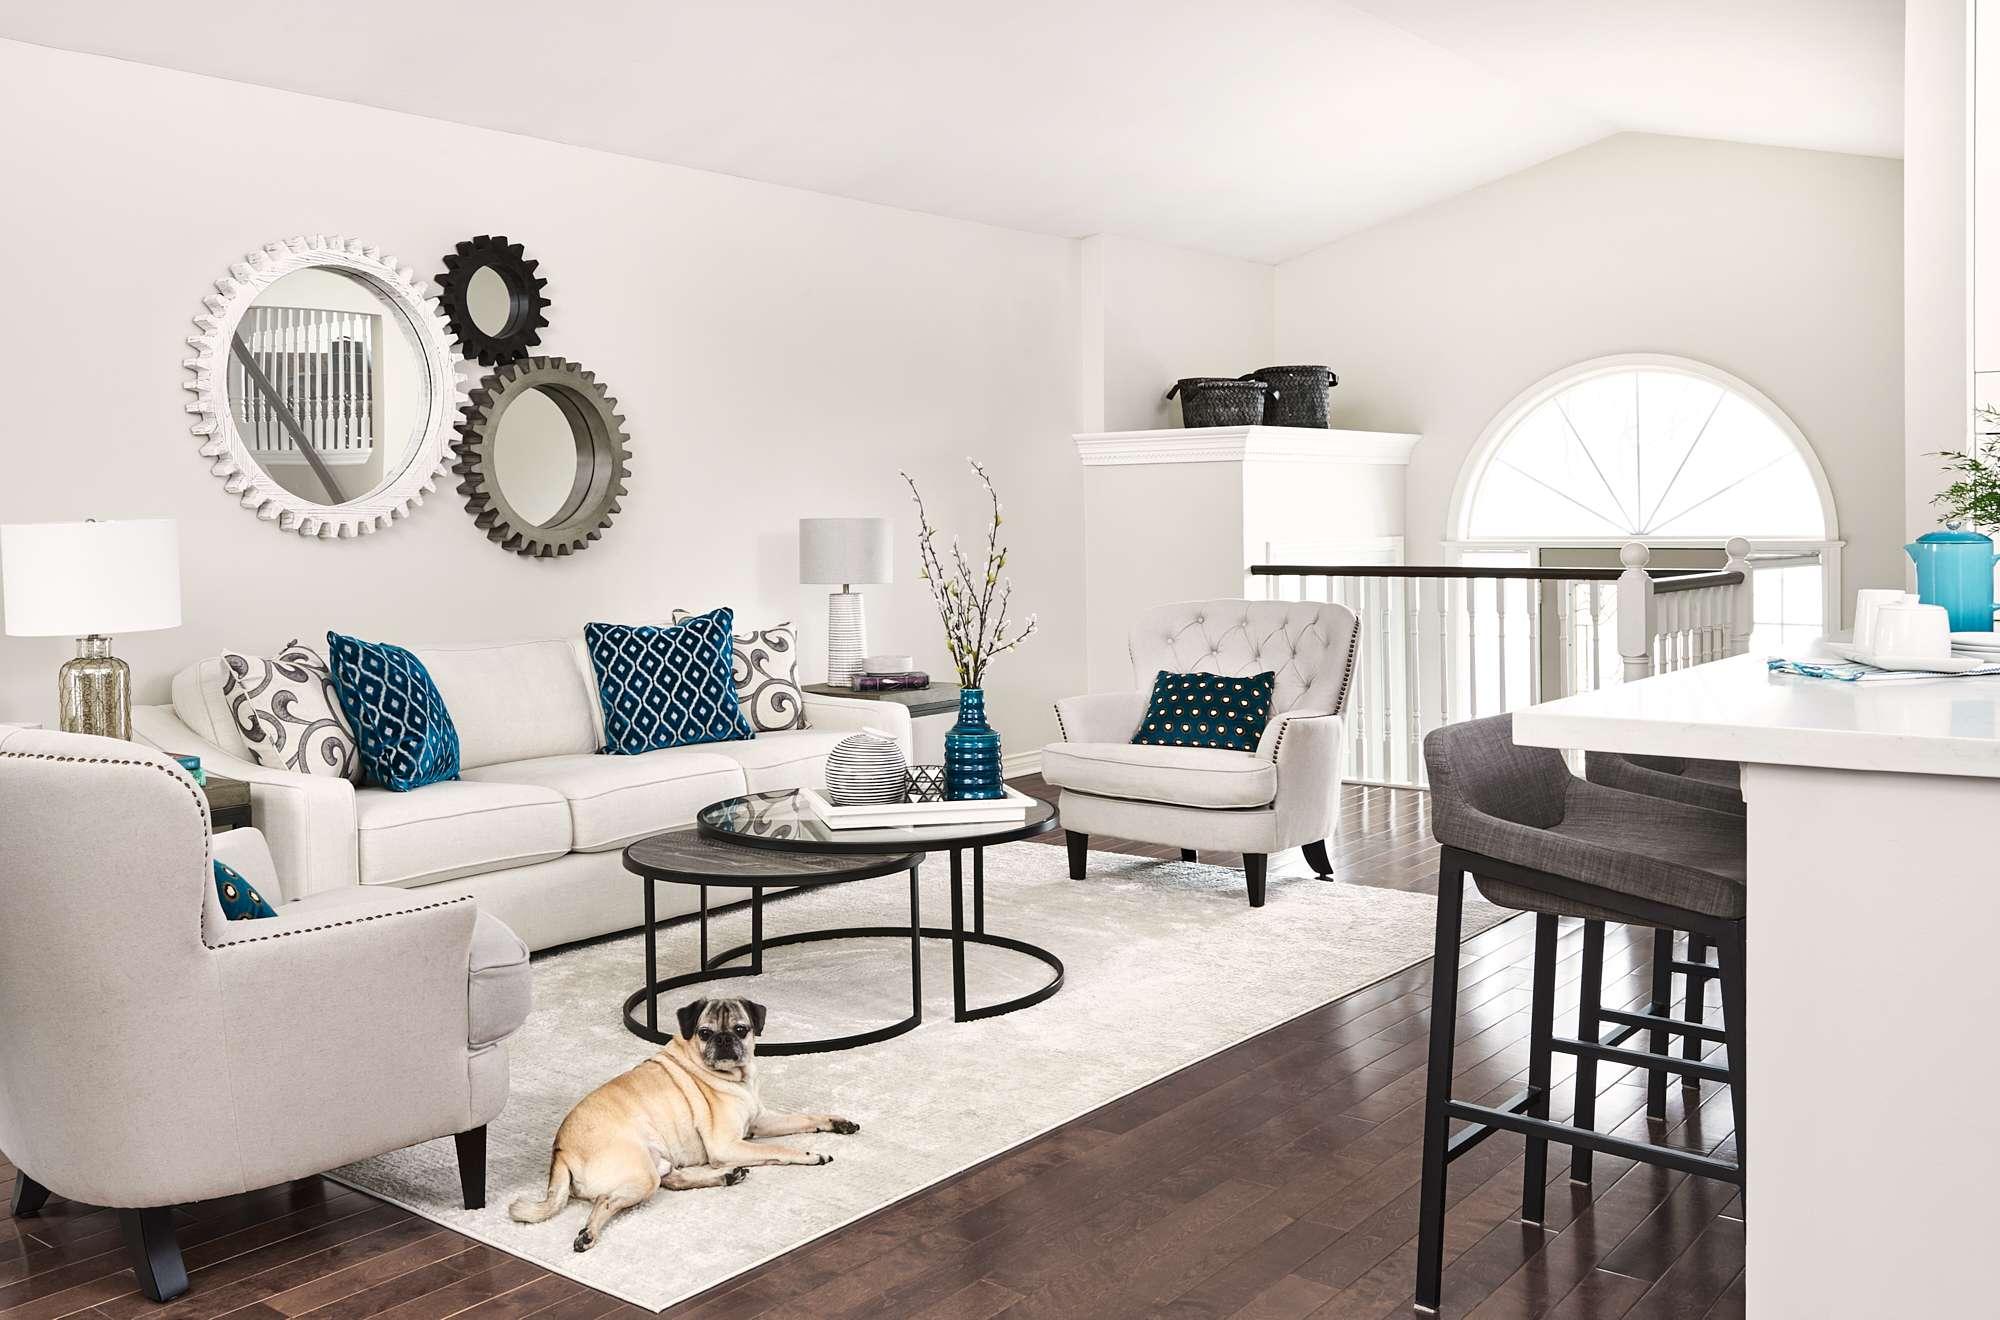 Pet friendly living room design performance fabrics light and bright